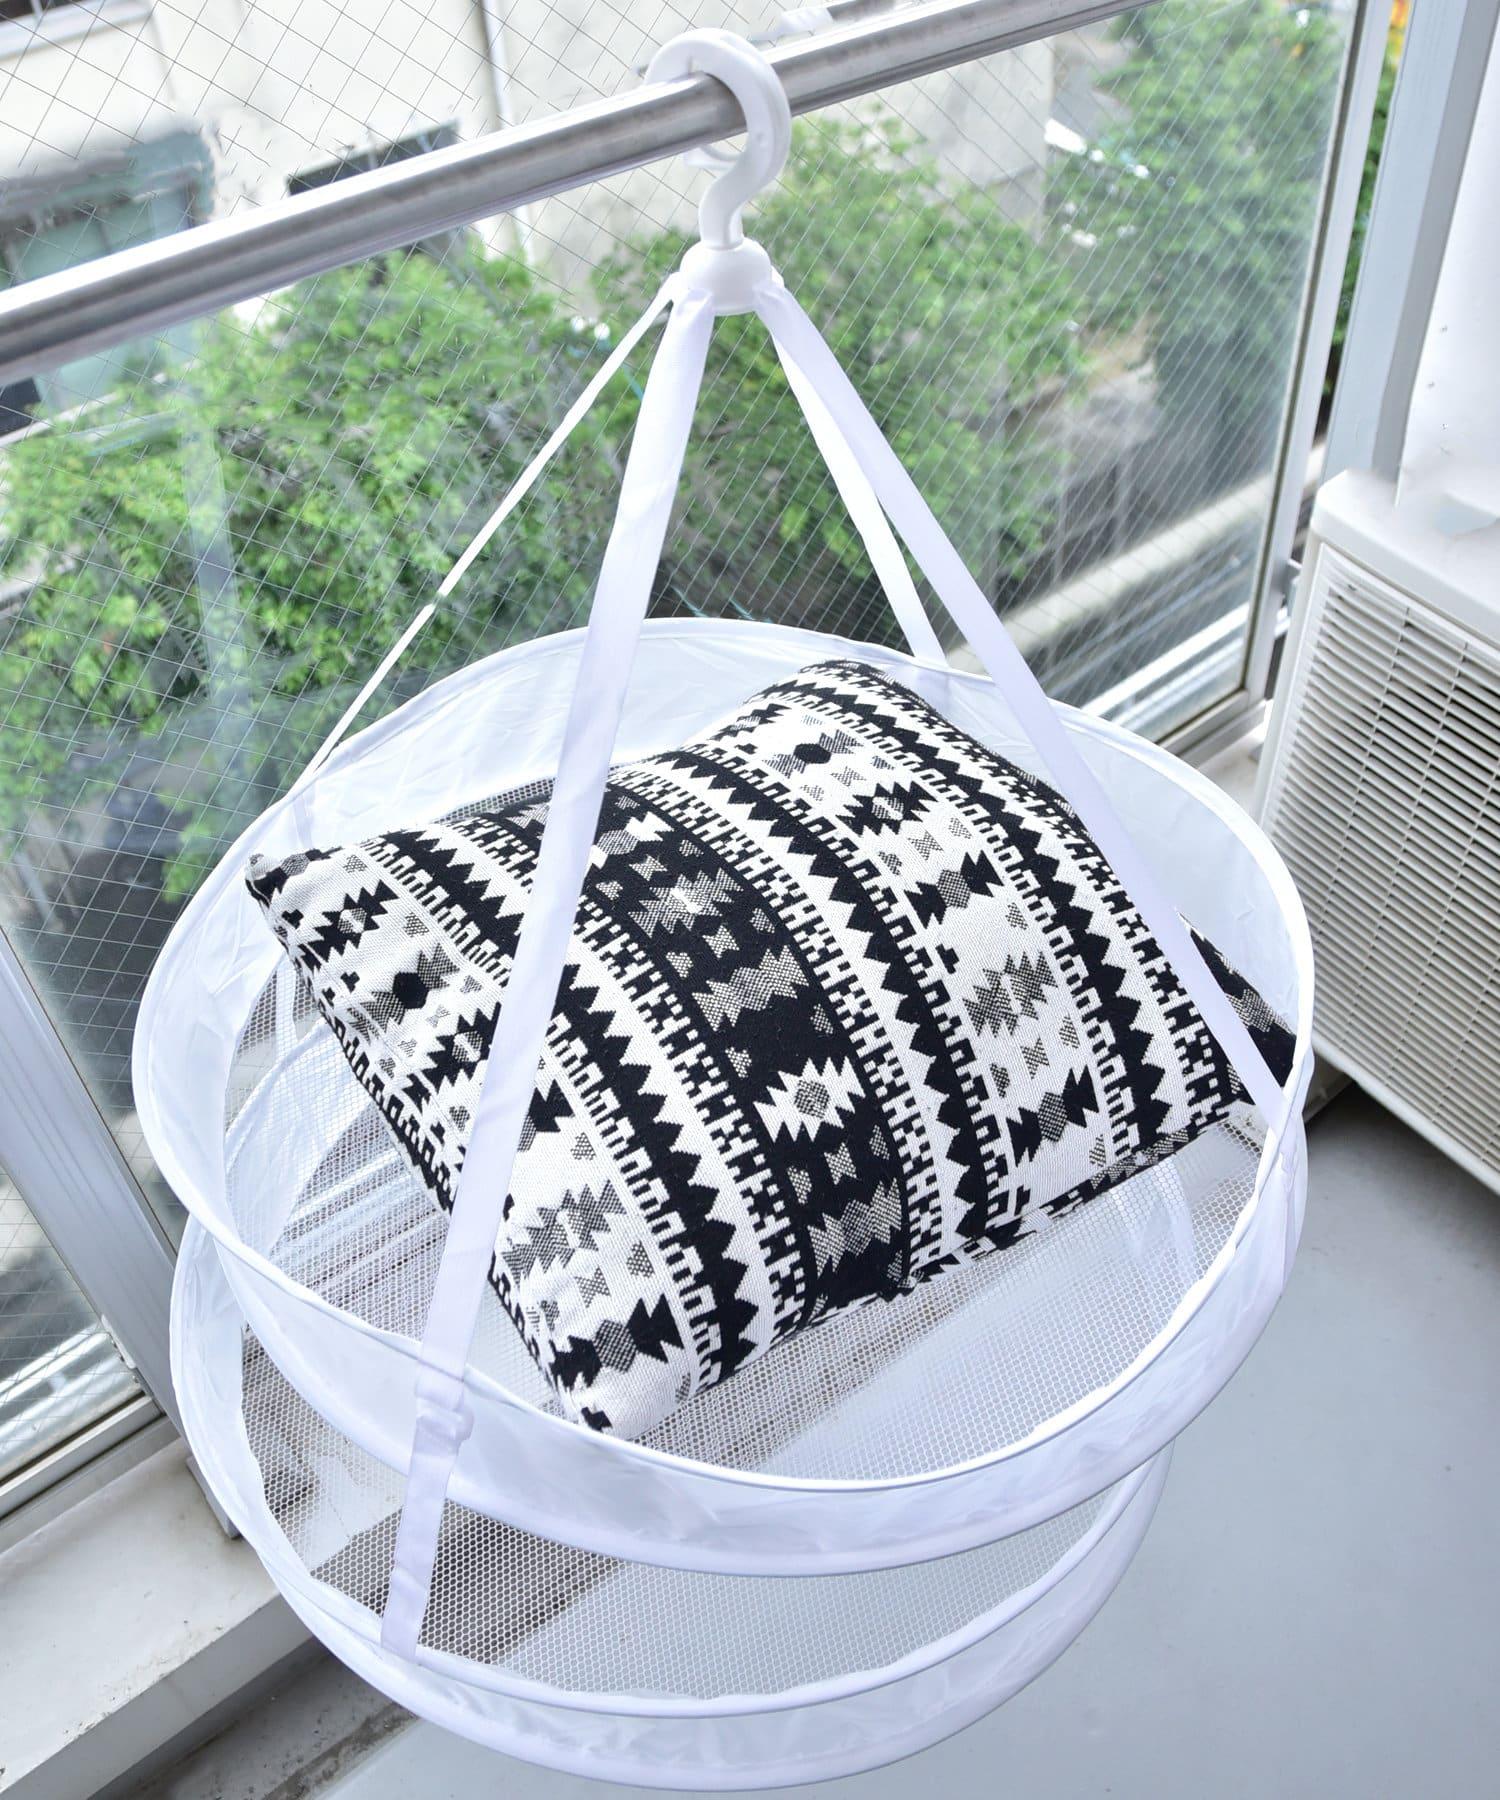 3COINS(スリーコインズ) ライフスタイル 【お洗濯をより快適に】衣類干しネット グレー